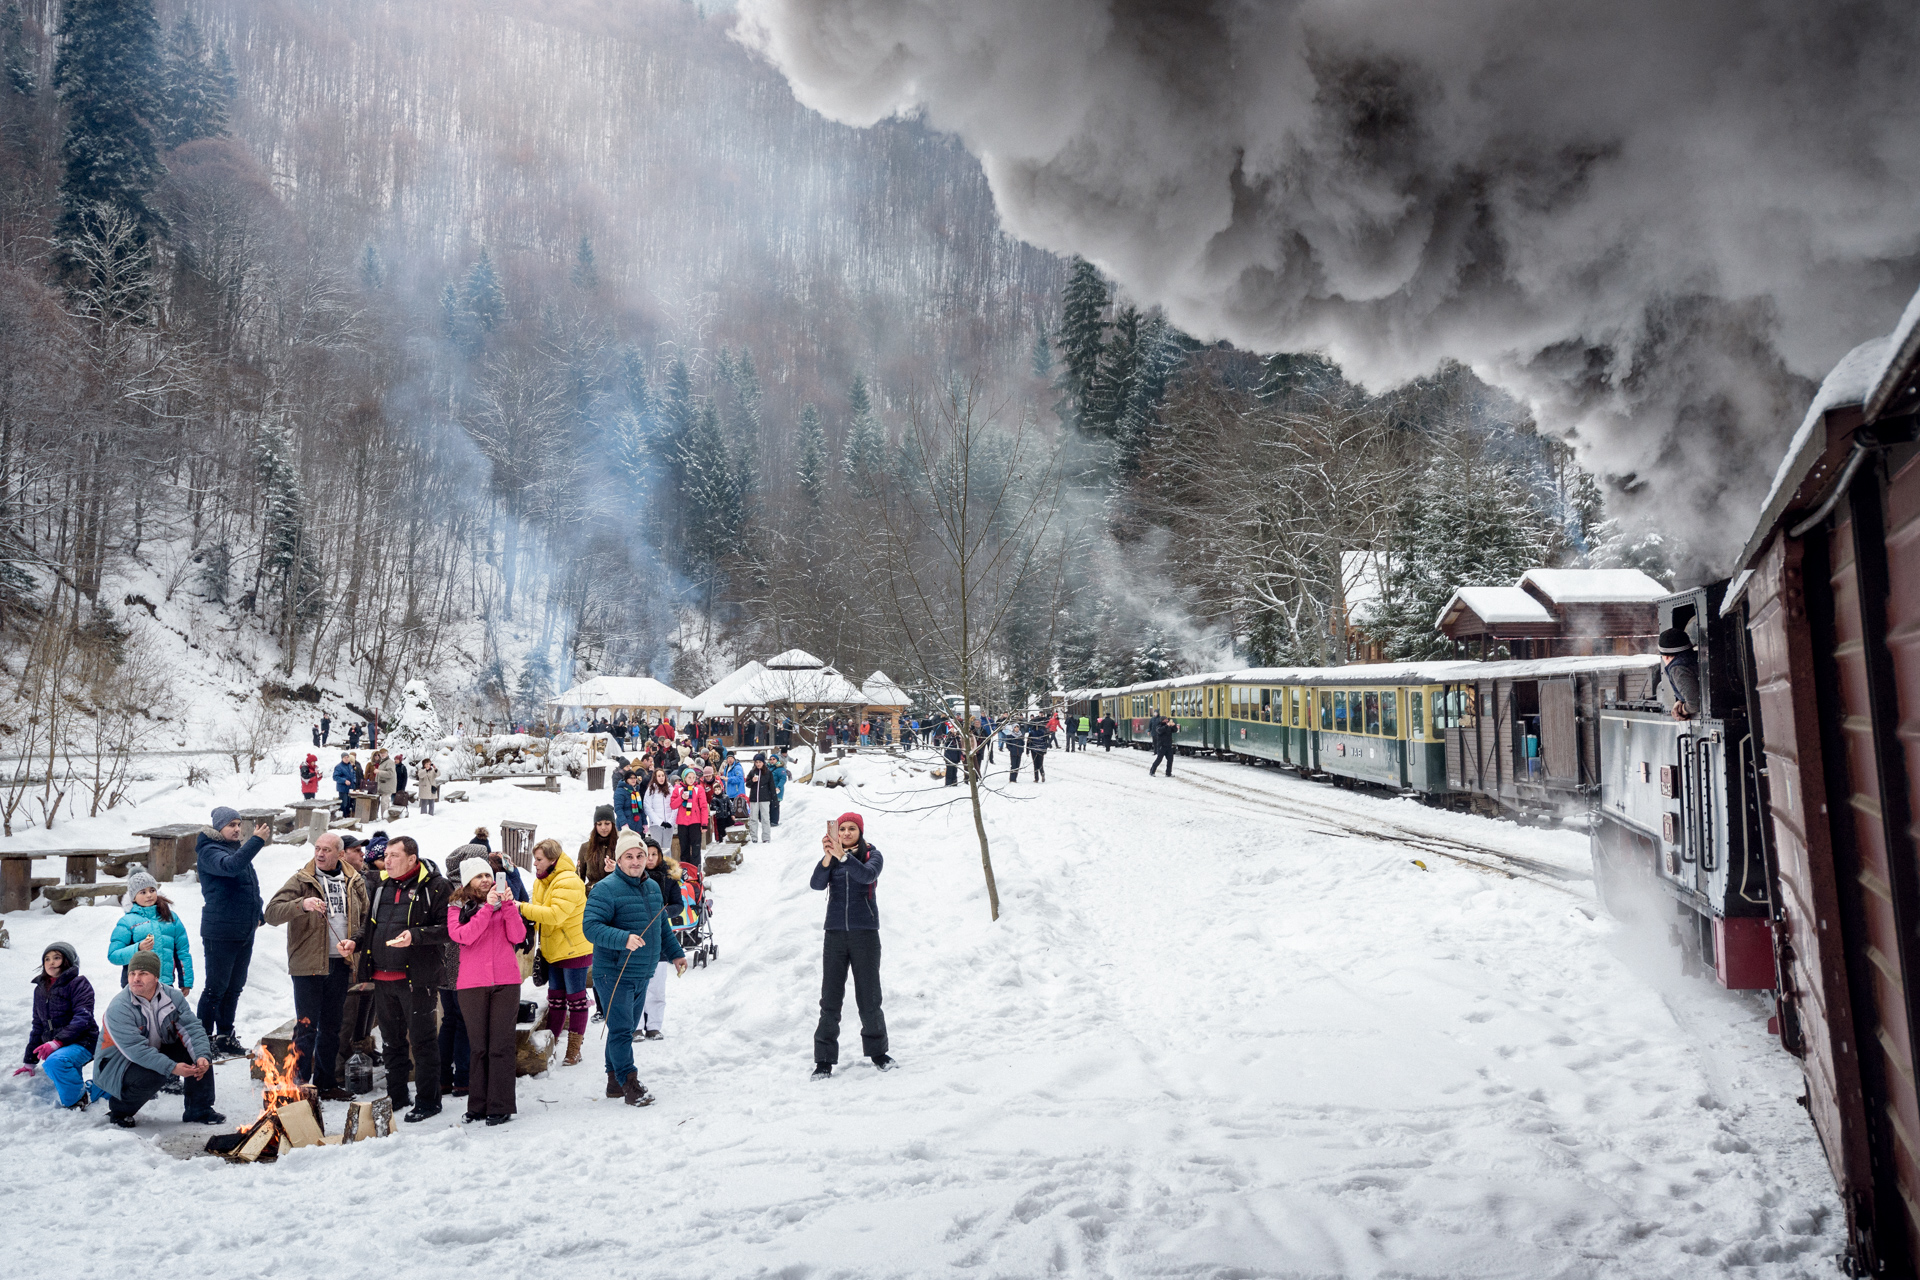 Jörg_Müller_Carpathian-forest-steam-train